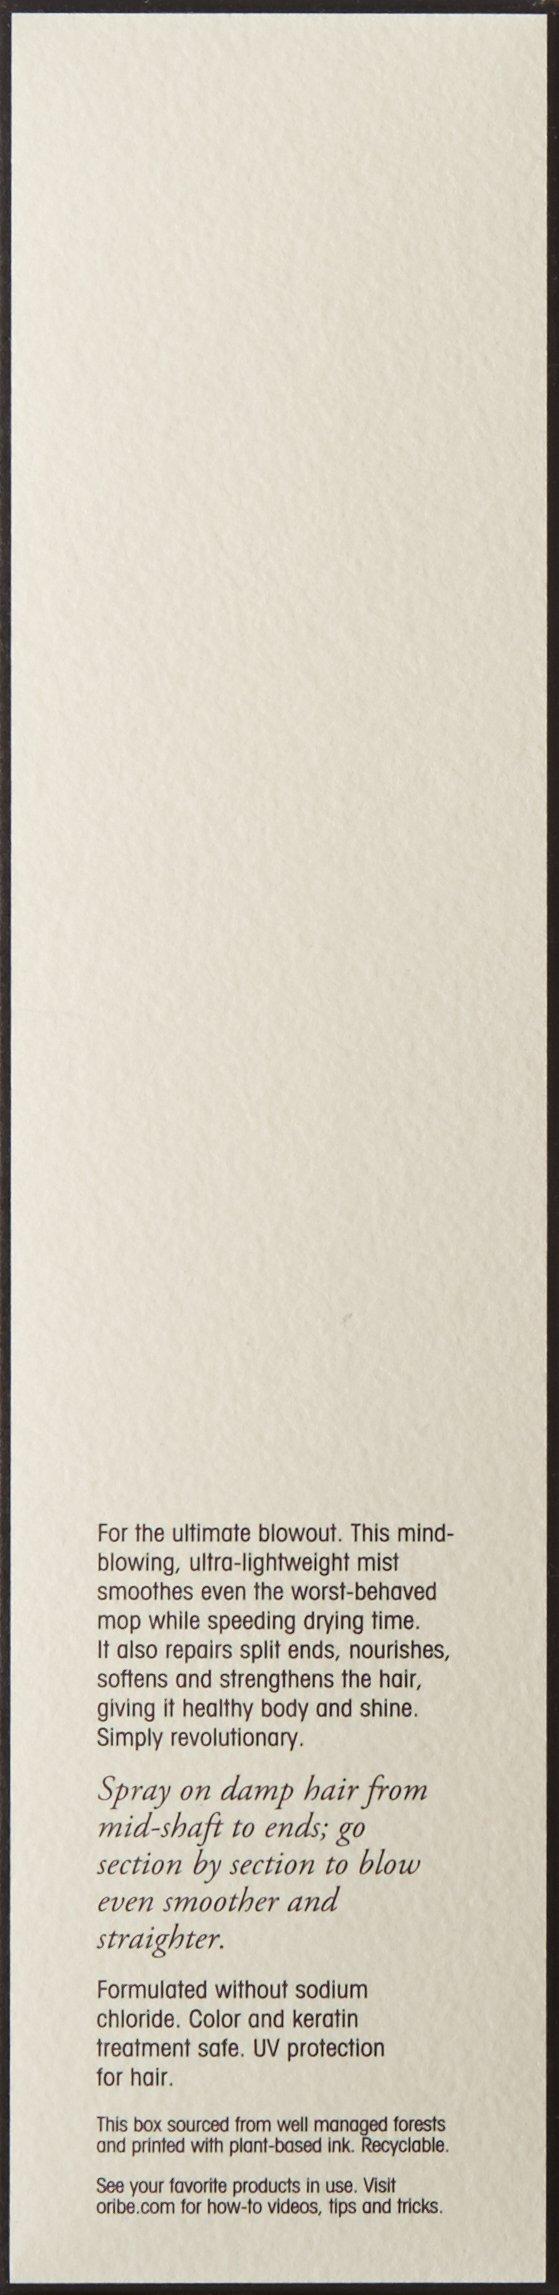 ORIBE Royal Blowout Heat Styling Spray, 5.9 fl. oz. by ORIBE (Image #7)